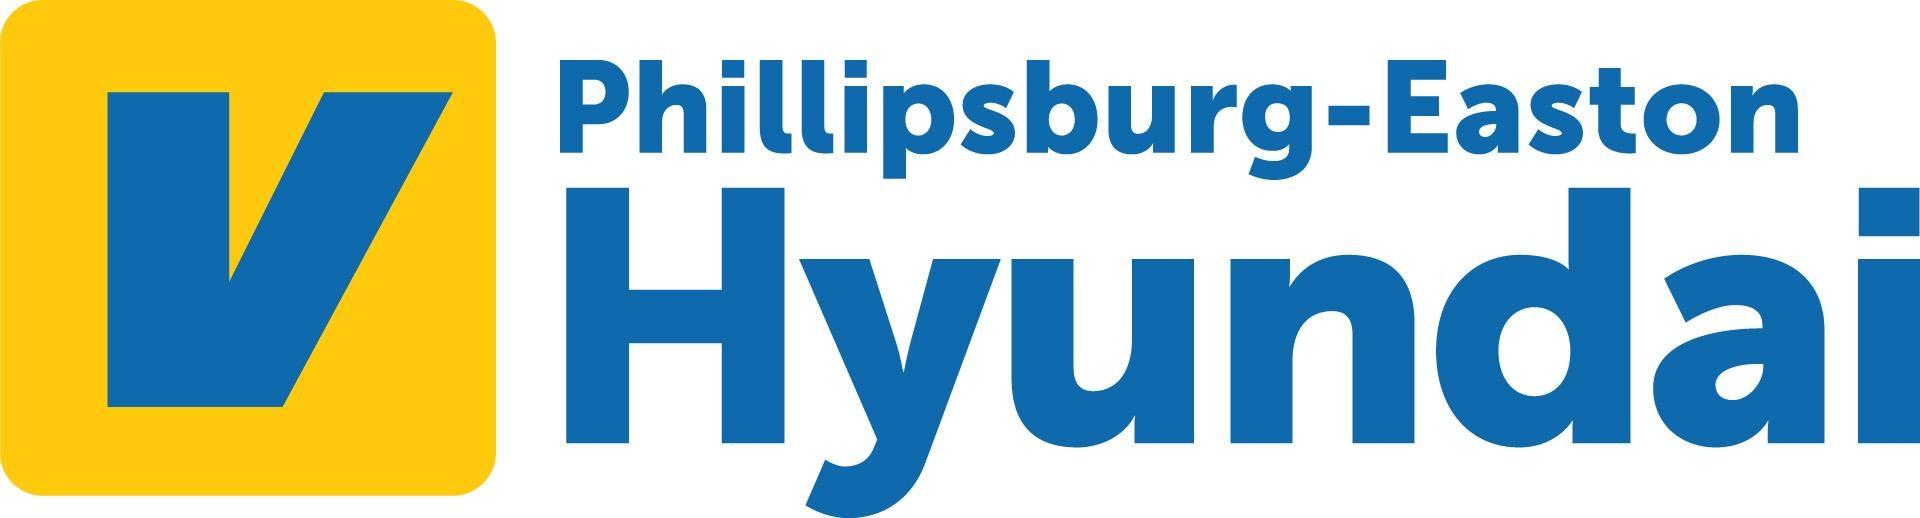 Phillipsburg Easton Hyundai - Closed